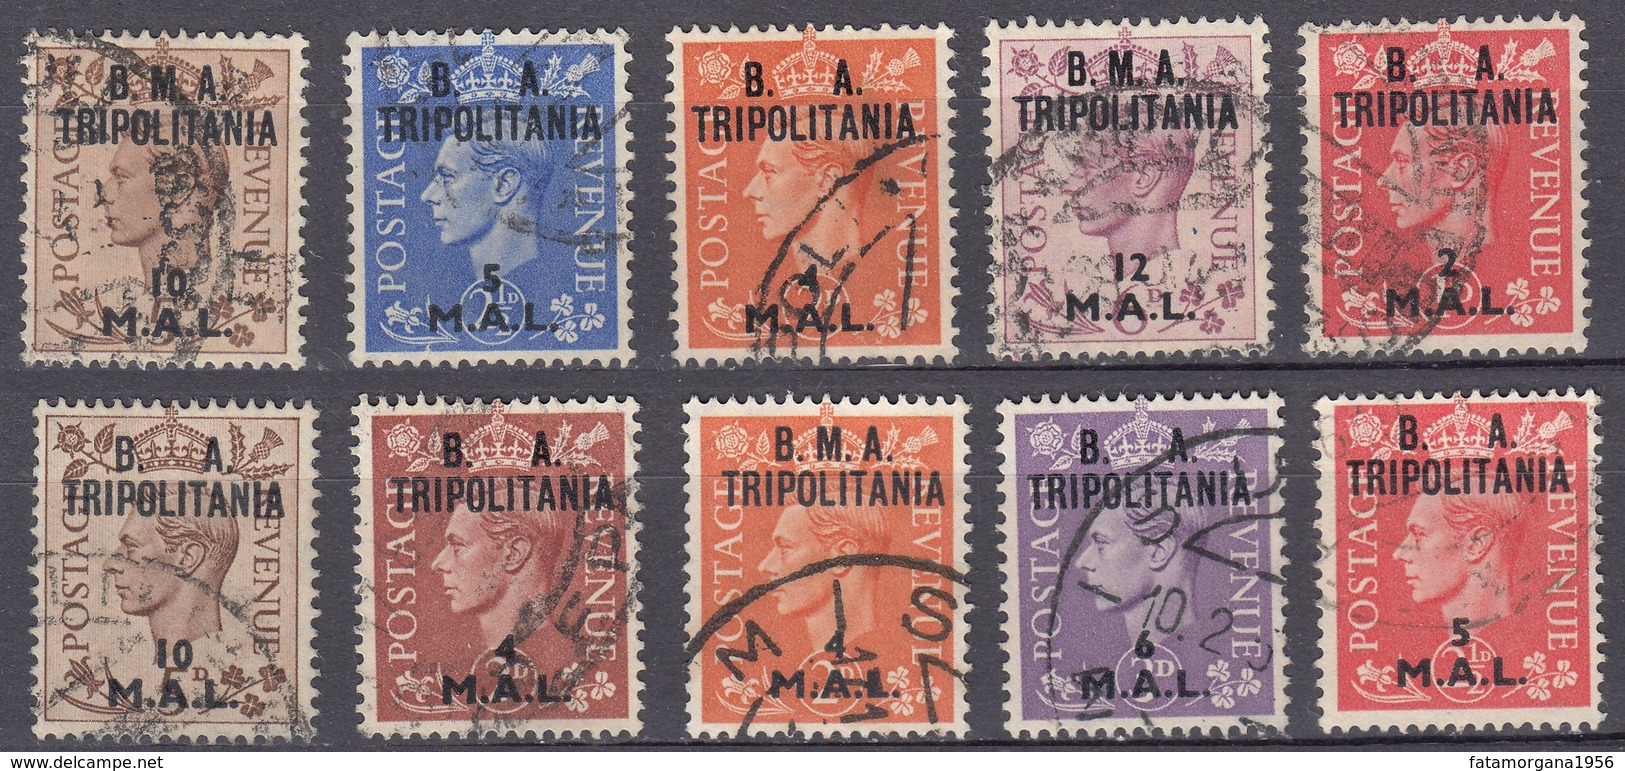 TRIPOLITANIA - OCCUPAZIONE Civile E Militare Britannica - Lotto Di 10 Valori Diversi  Assortiti, Come Da Immagine. - Zuidwest-Afrika (1923-1990)